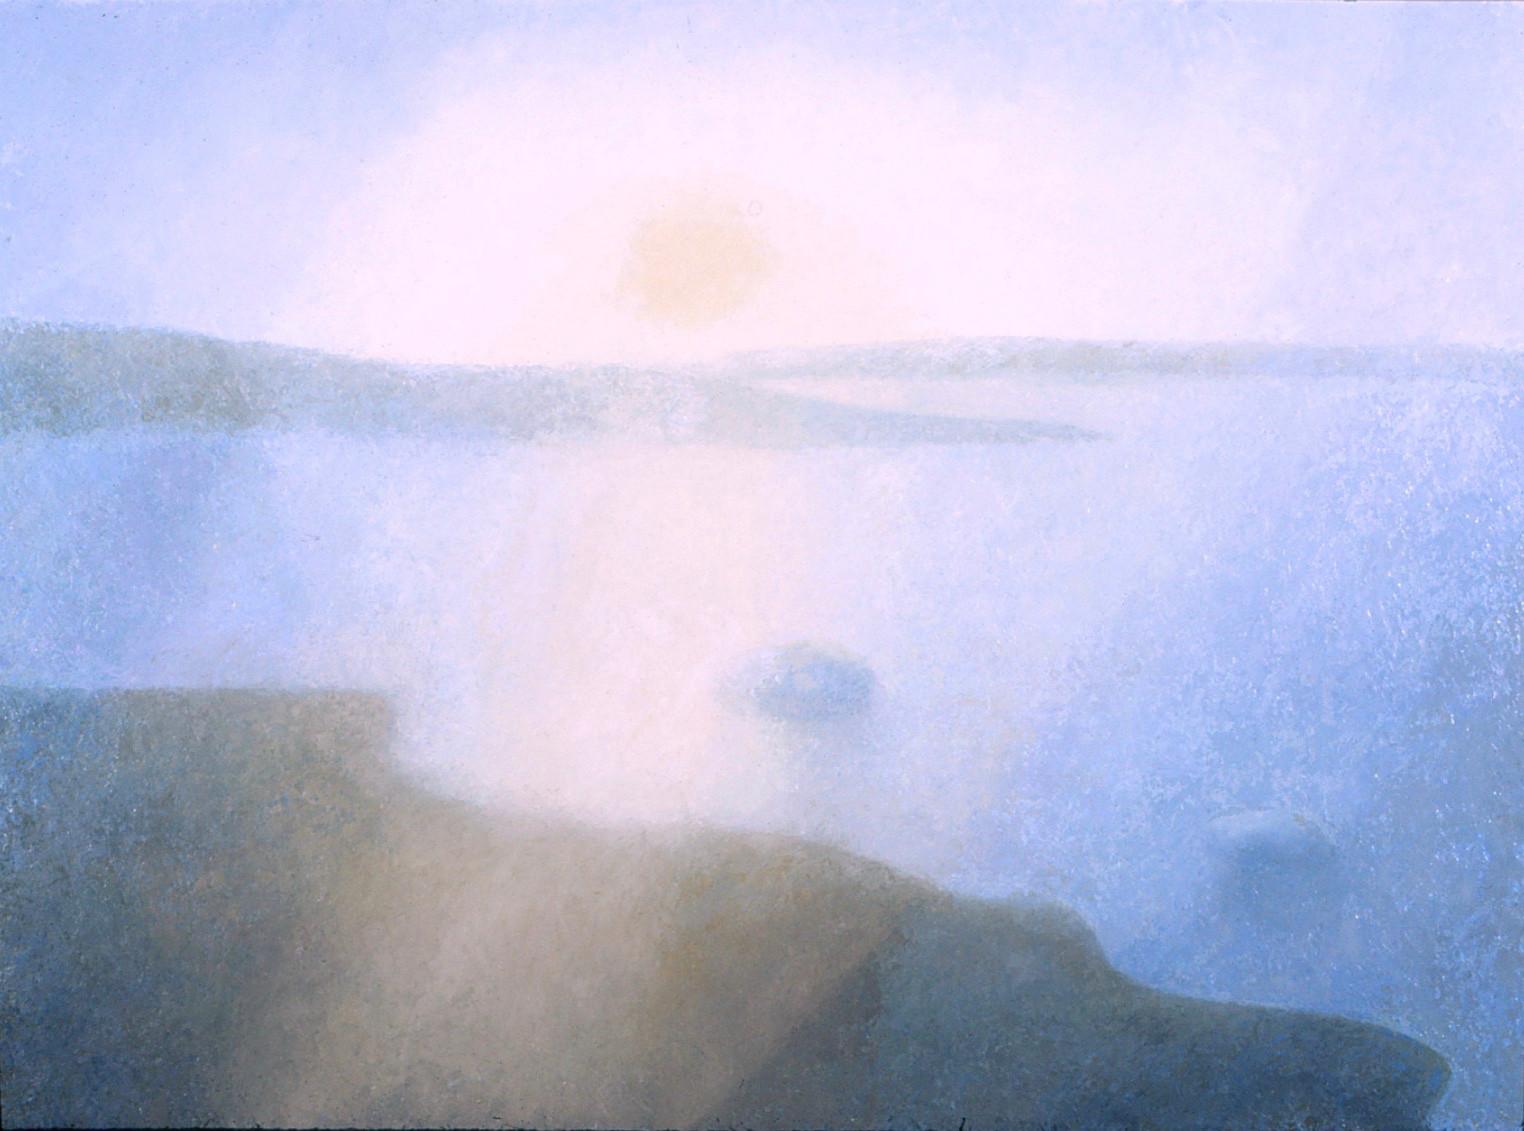 Shimmering Lake (Declining Day)